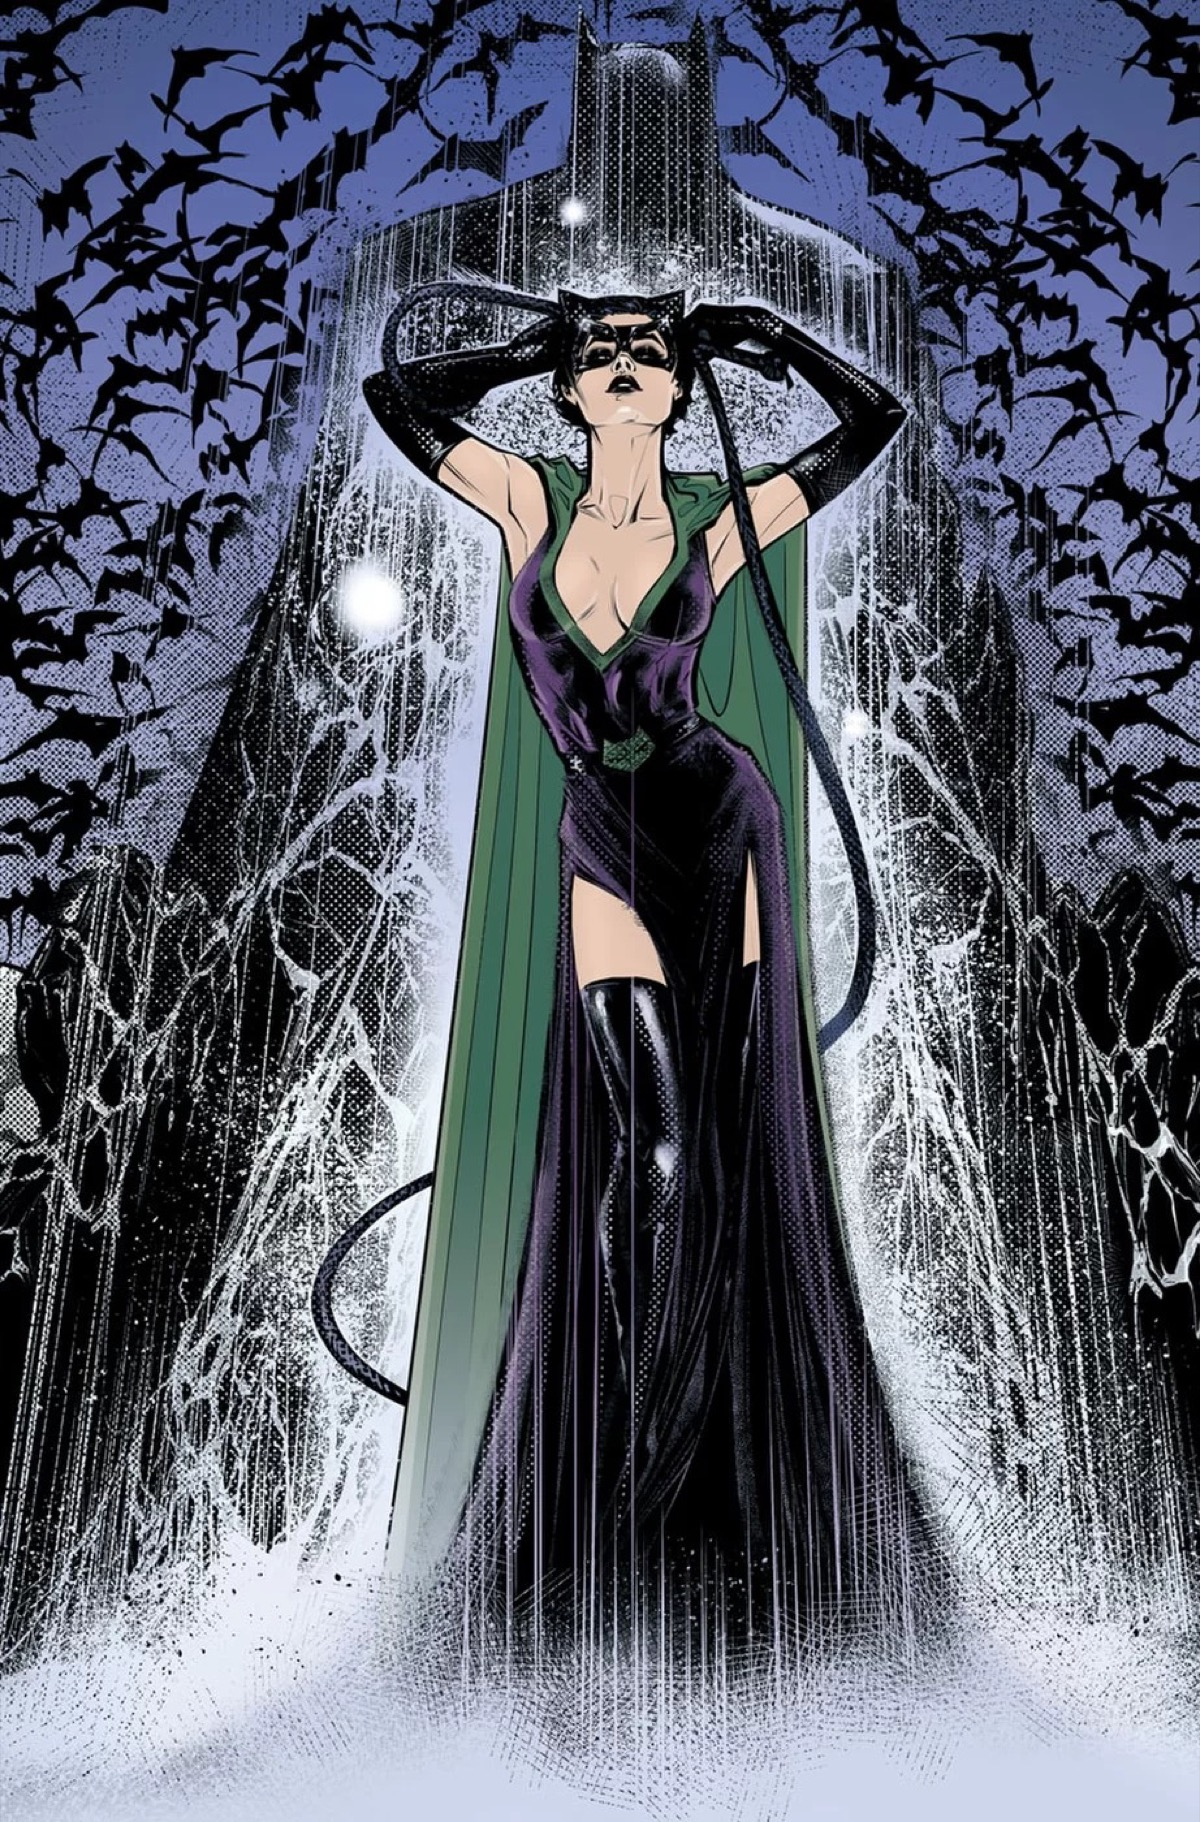 Will Catwoman Betray Batman in December?